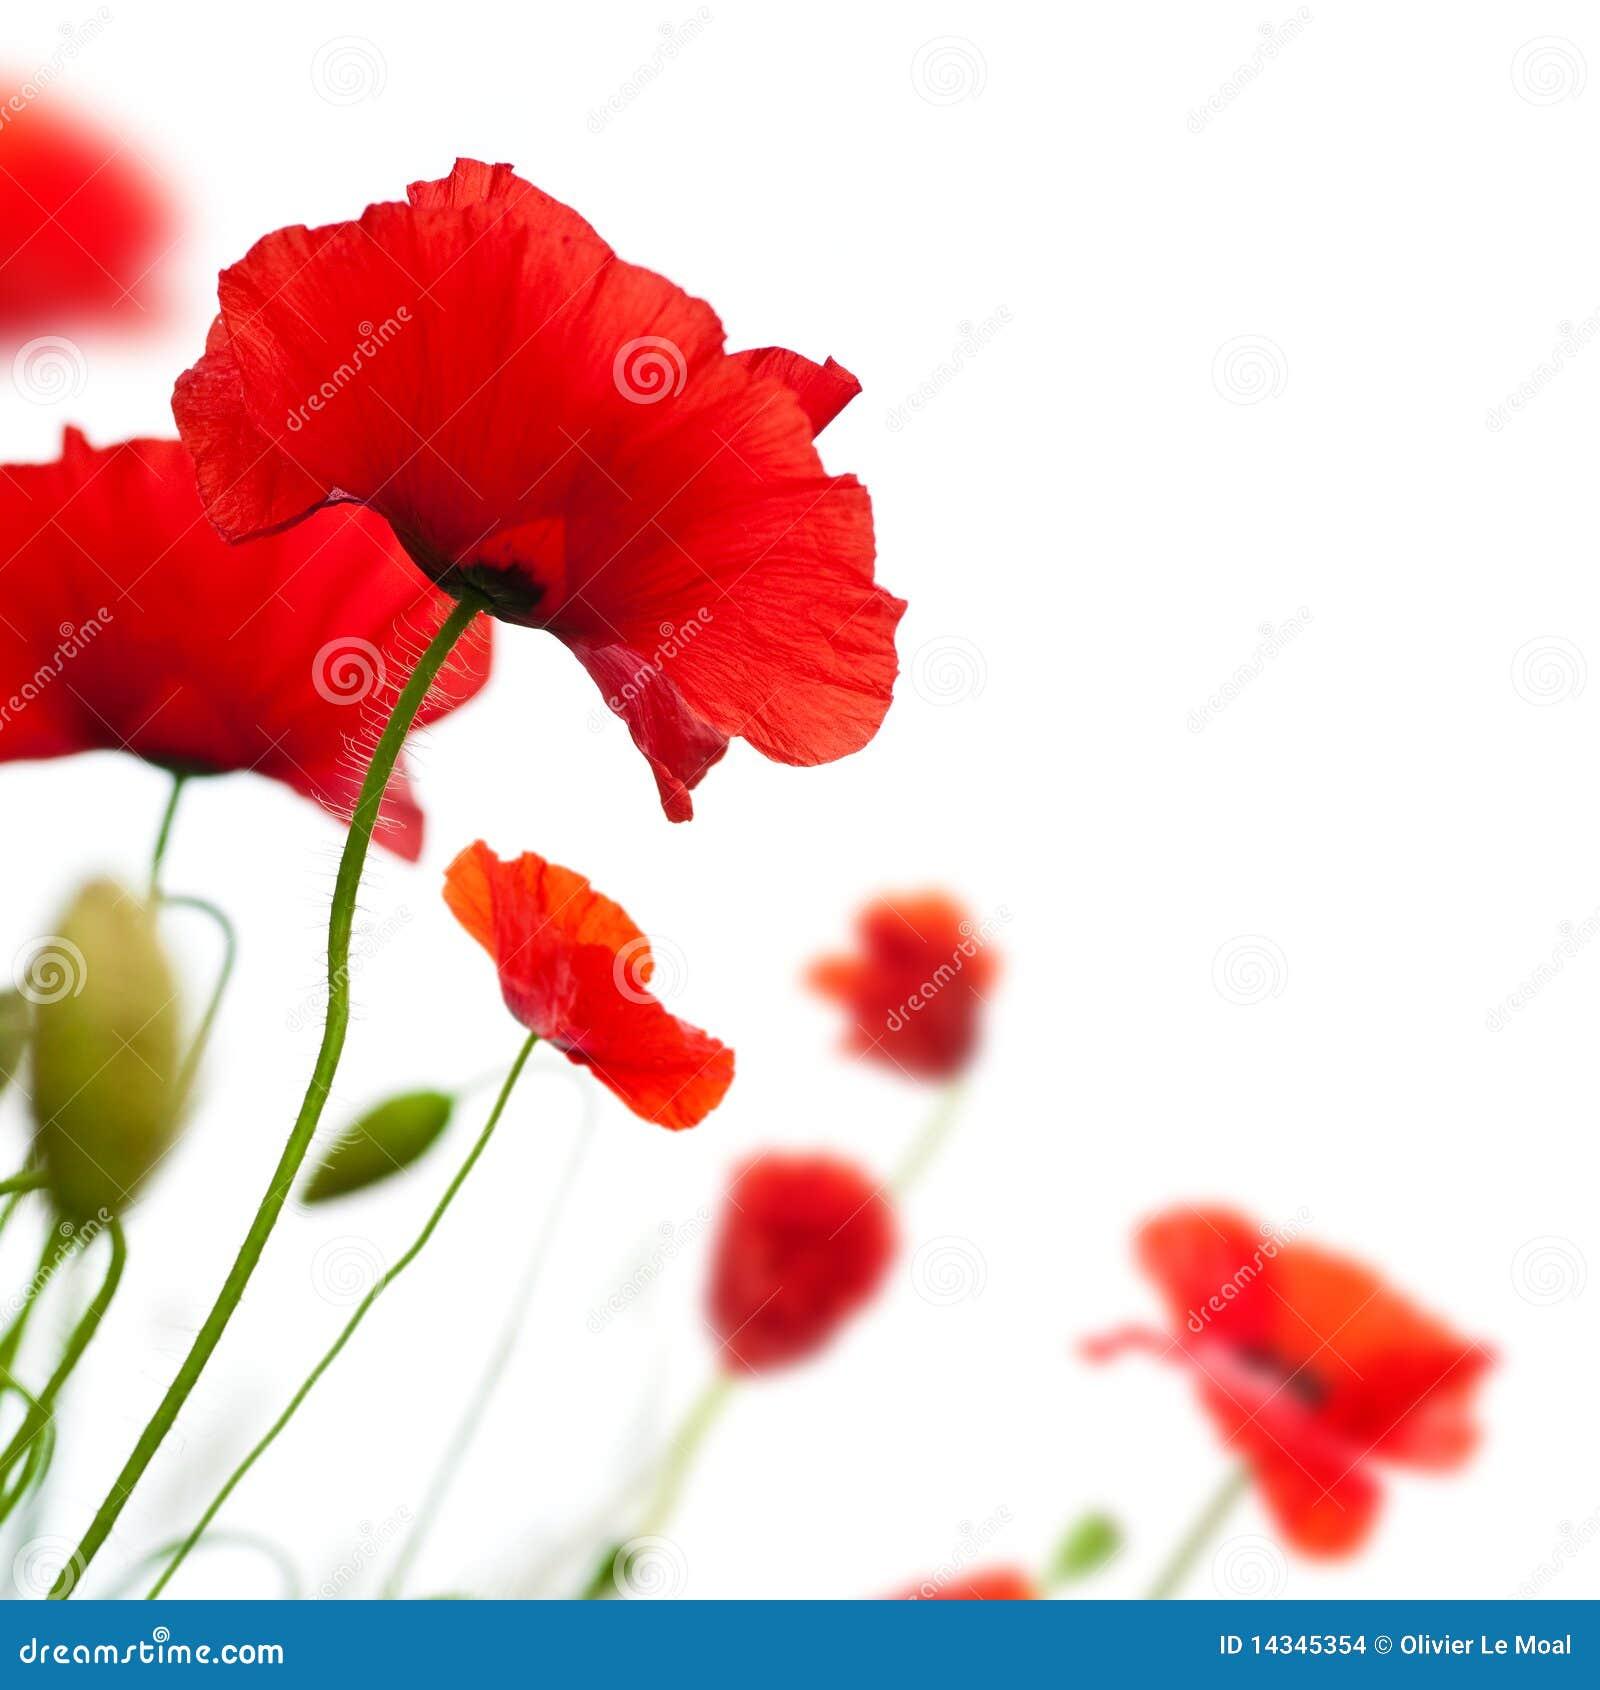 flower, Poppy isolated on white background